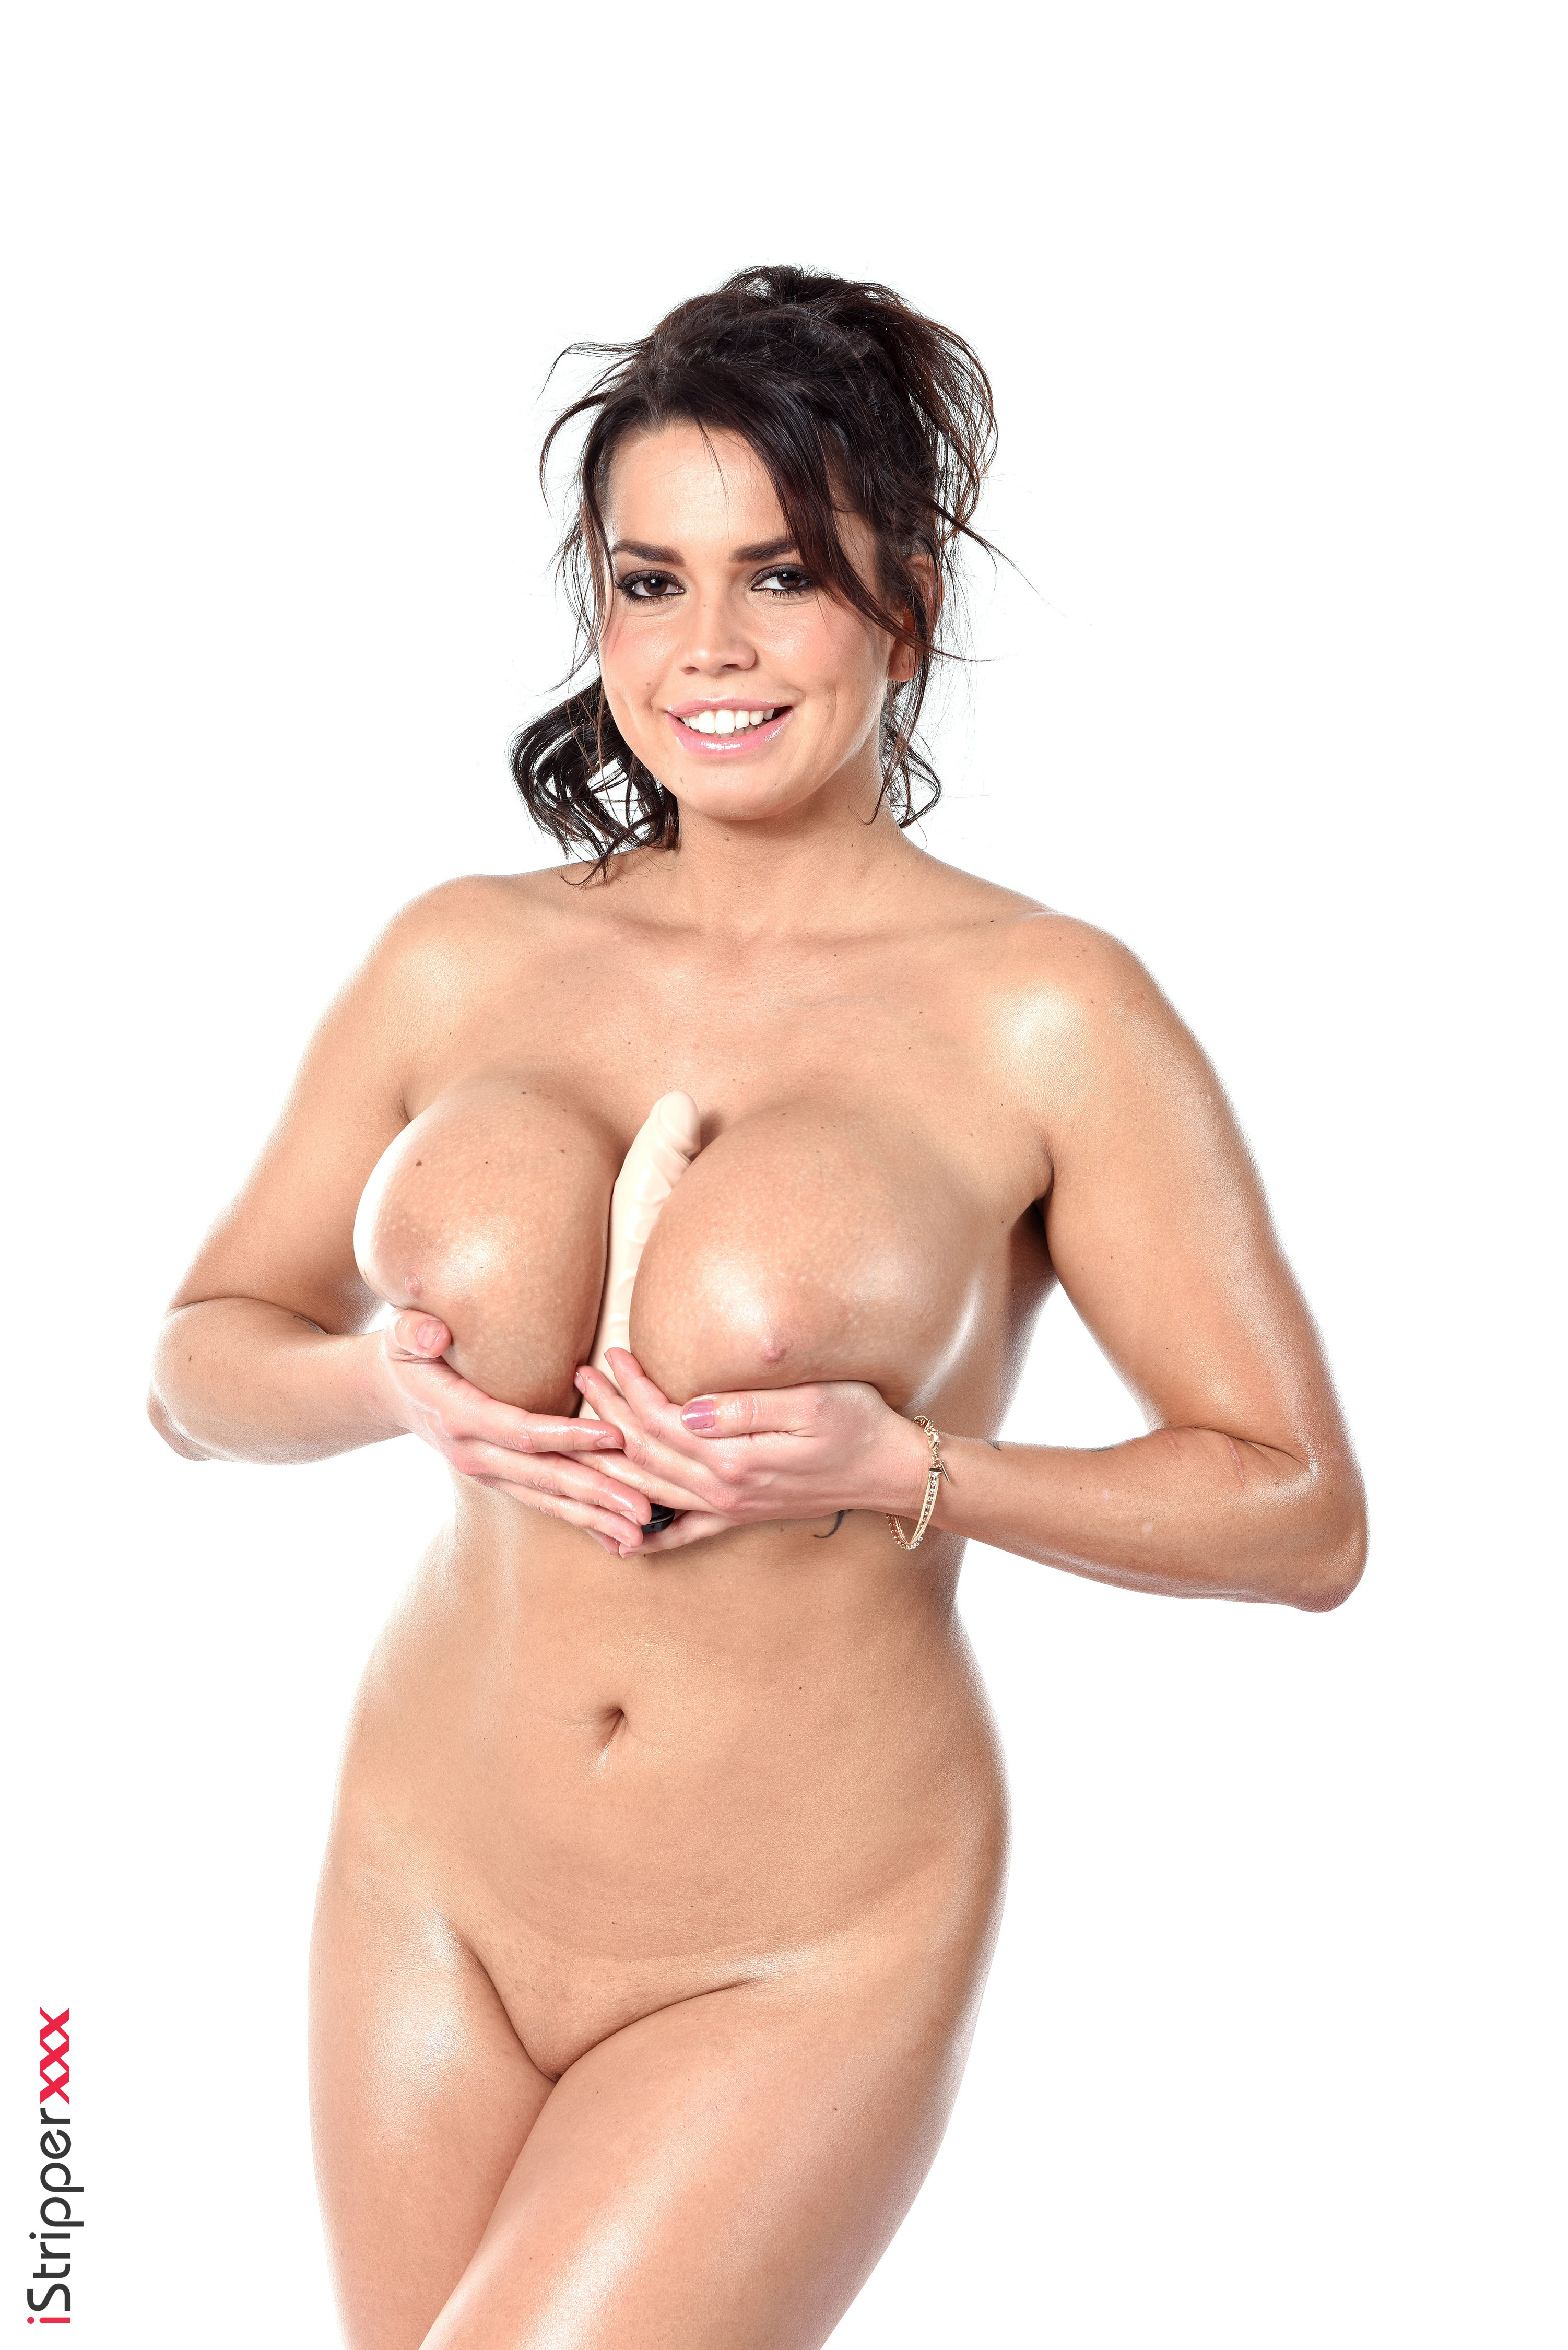 hot erotic girls pics